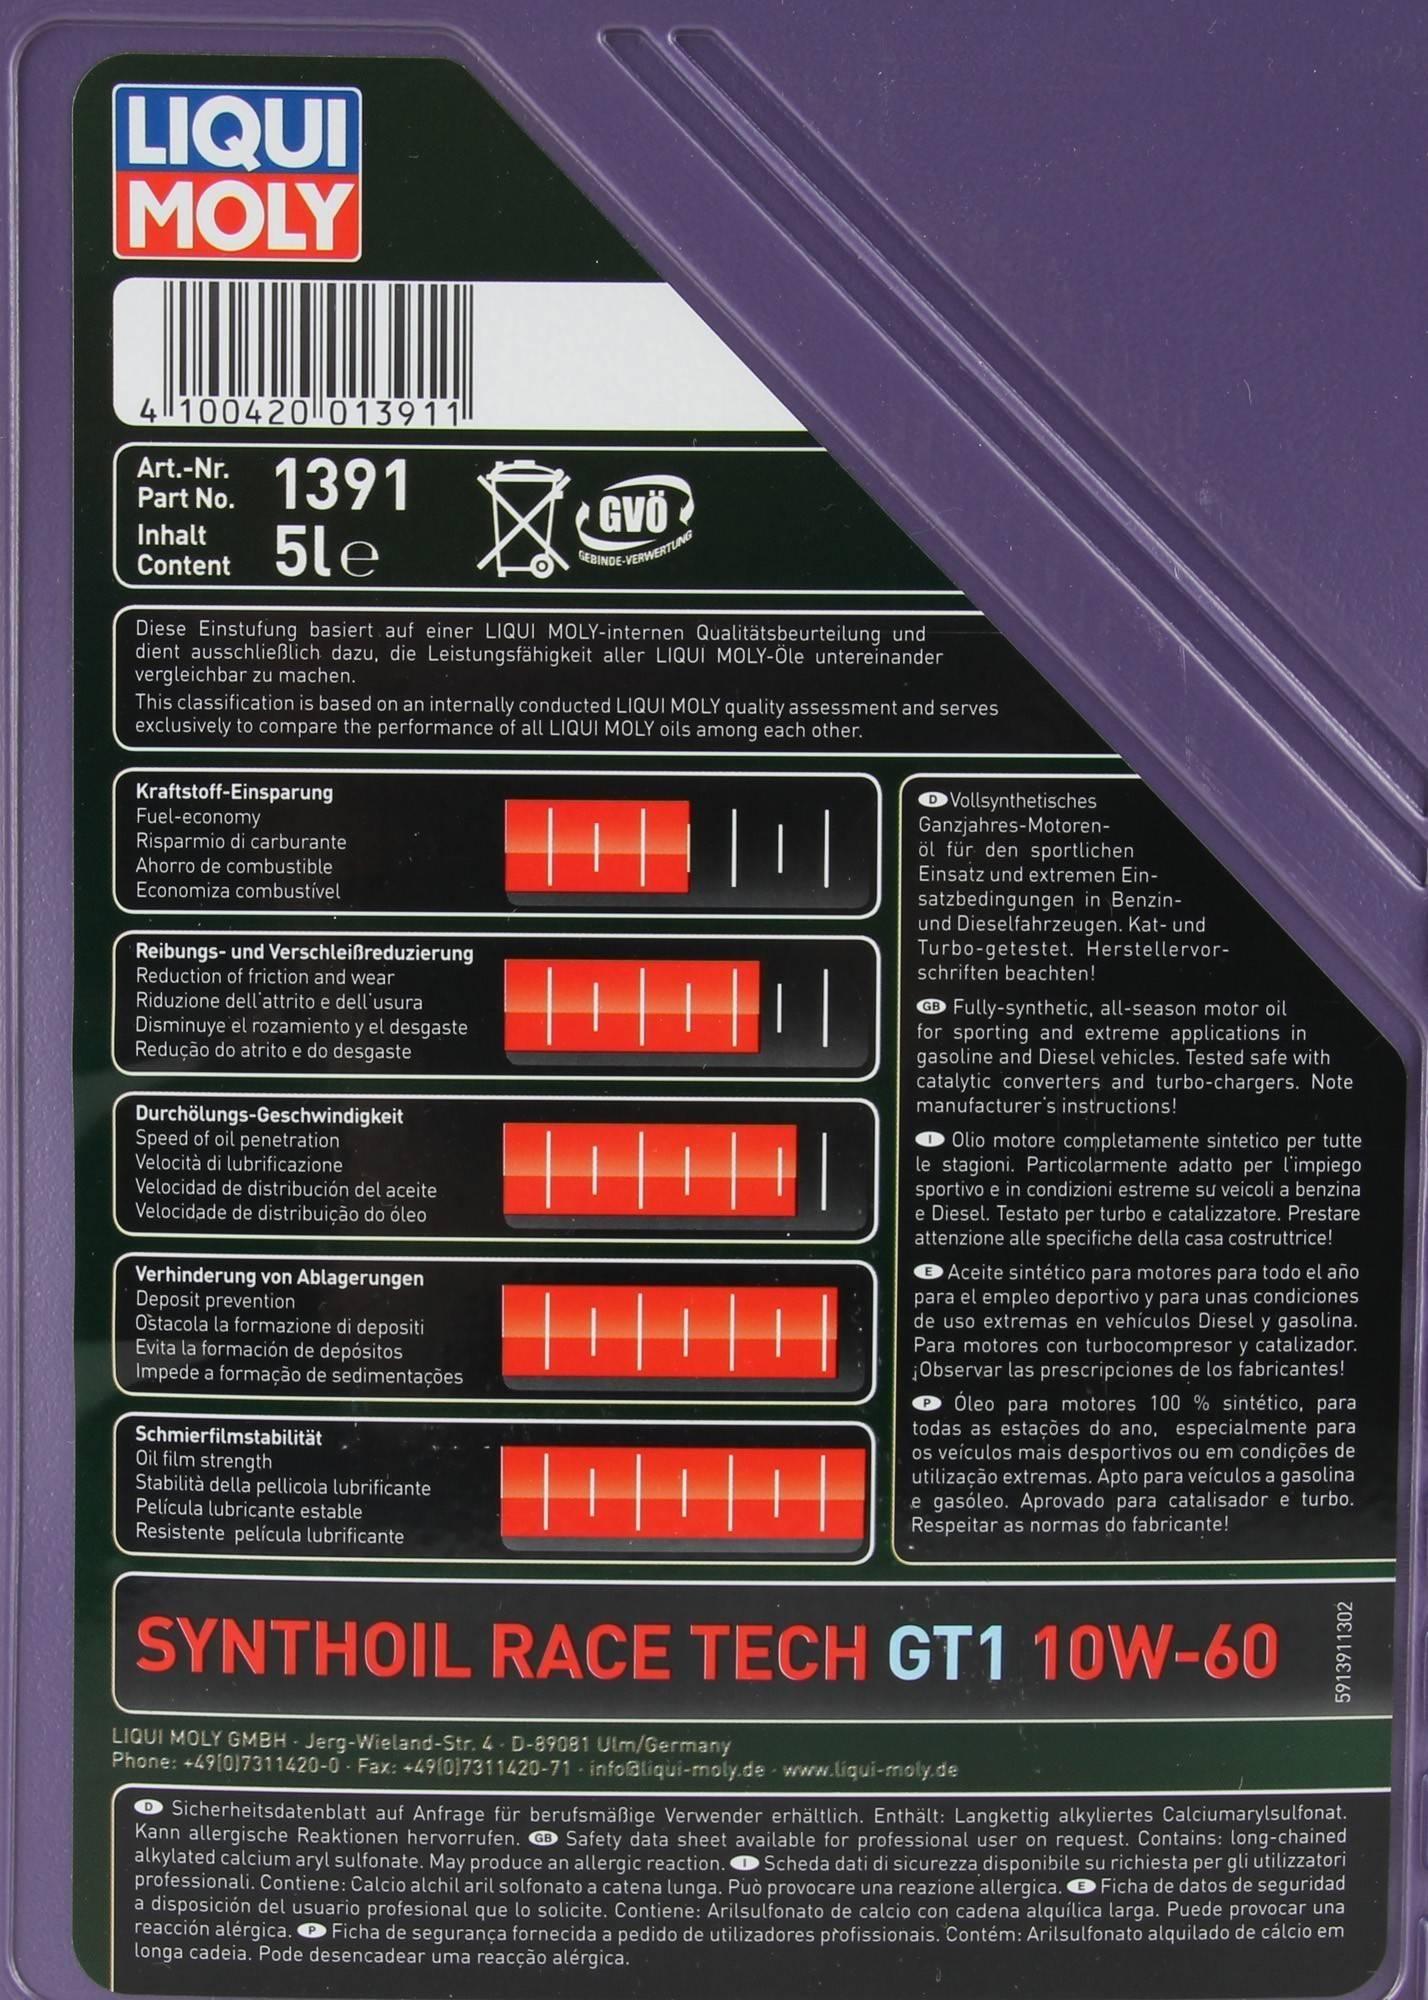 LIQUI MOLY Motoröl Öl SYNTHOIL RACE TECH GT1 10W60 10W-60 5L 5 Liter 1391